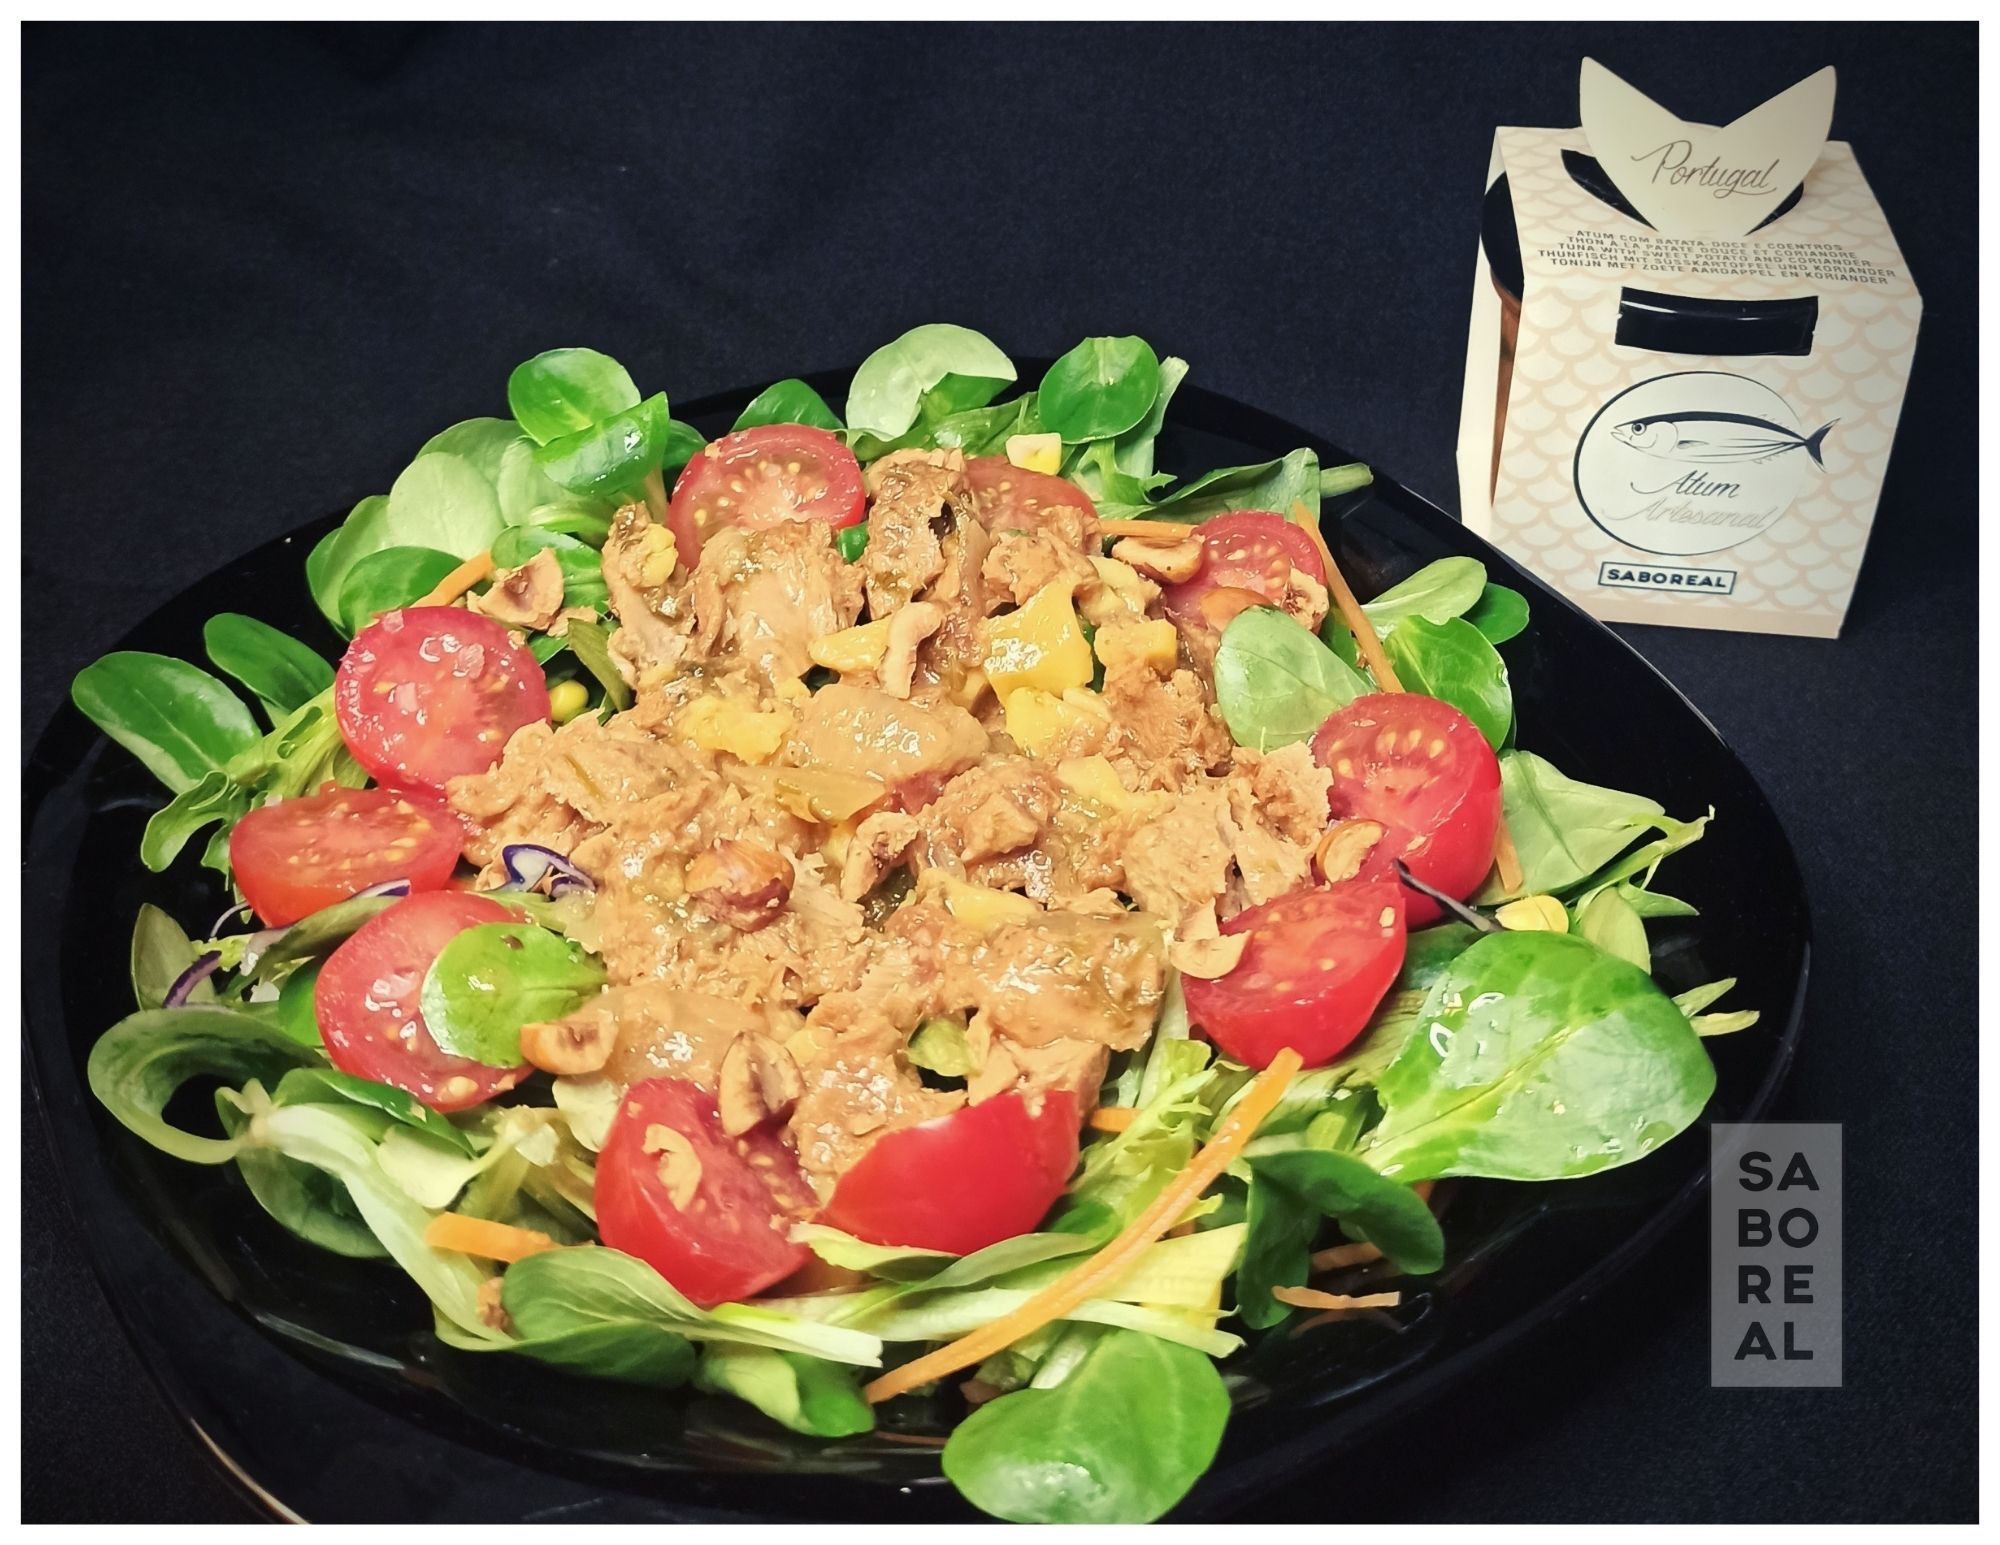 Salade fraîche avec une petiscada